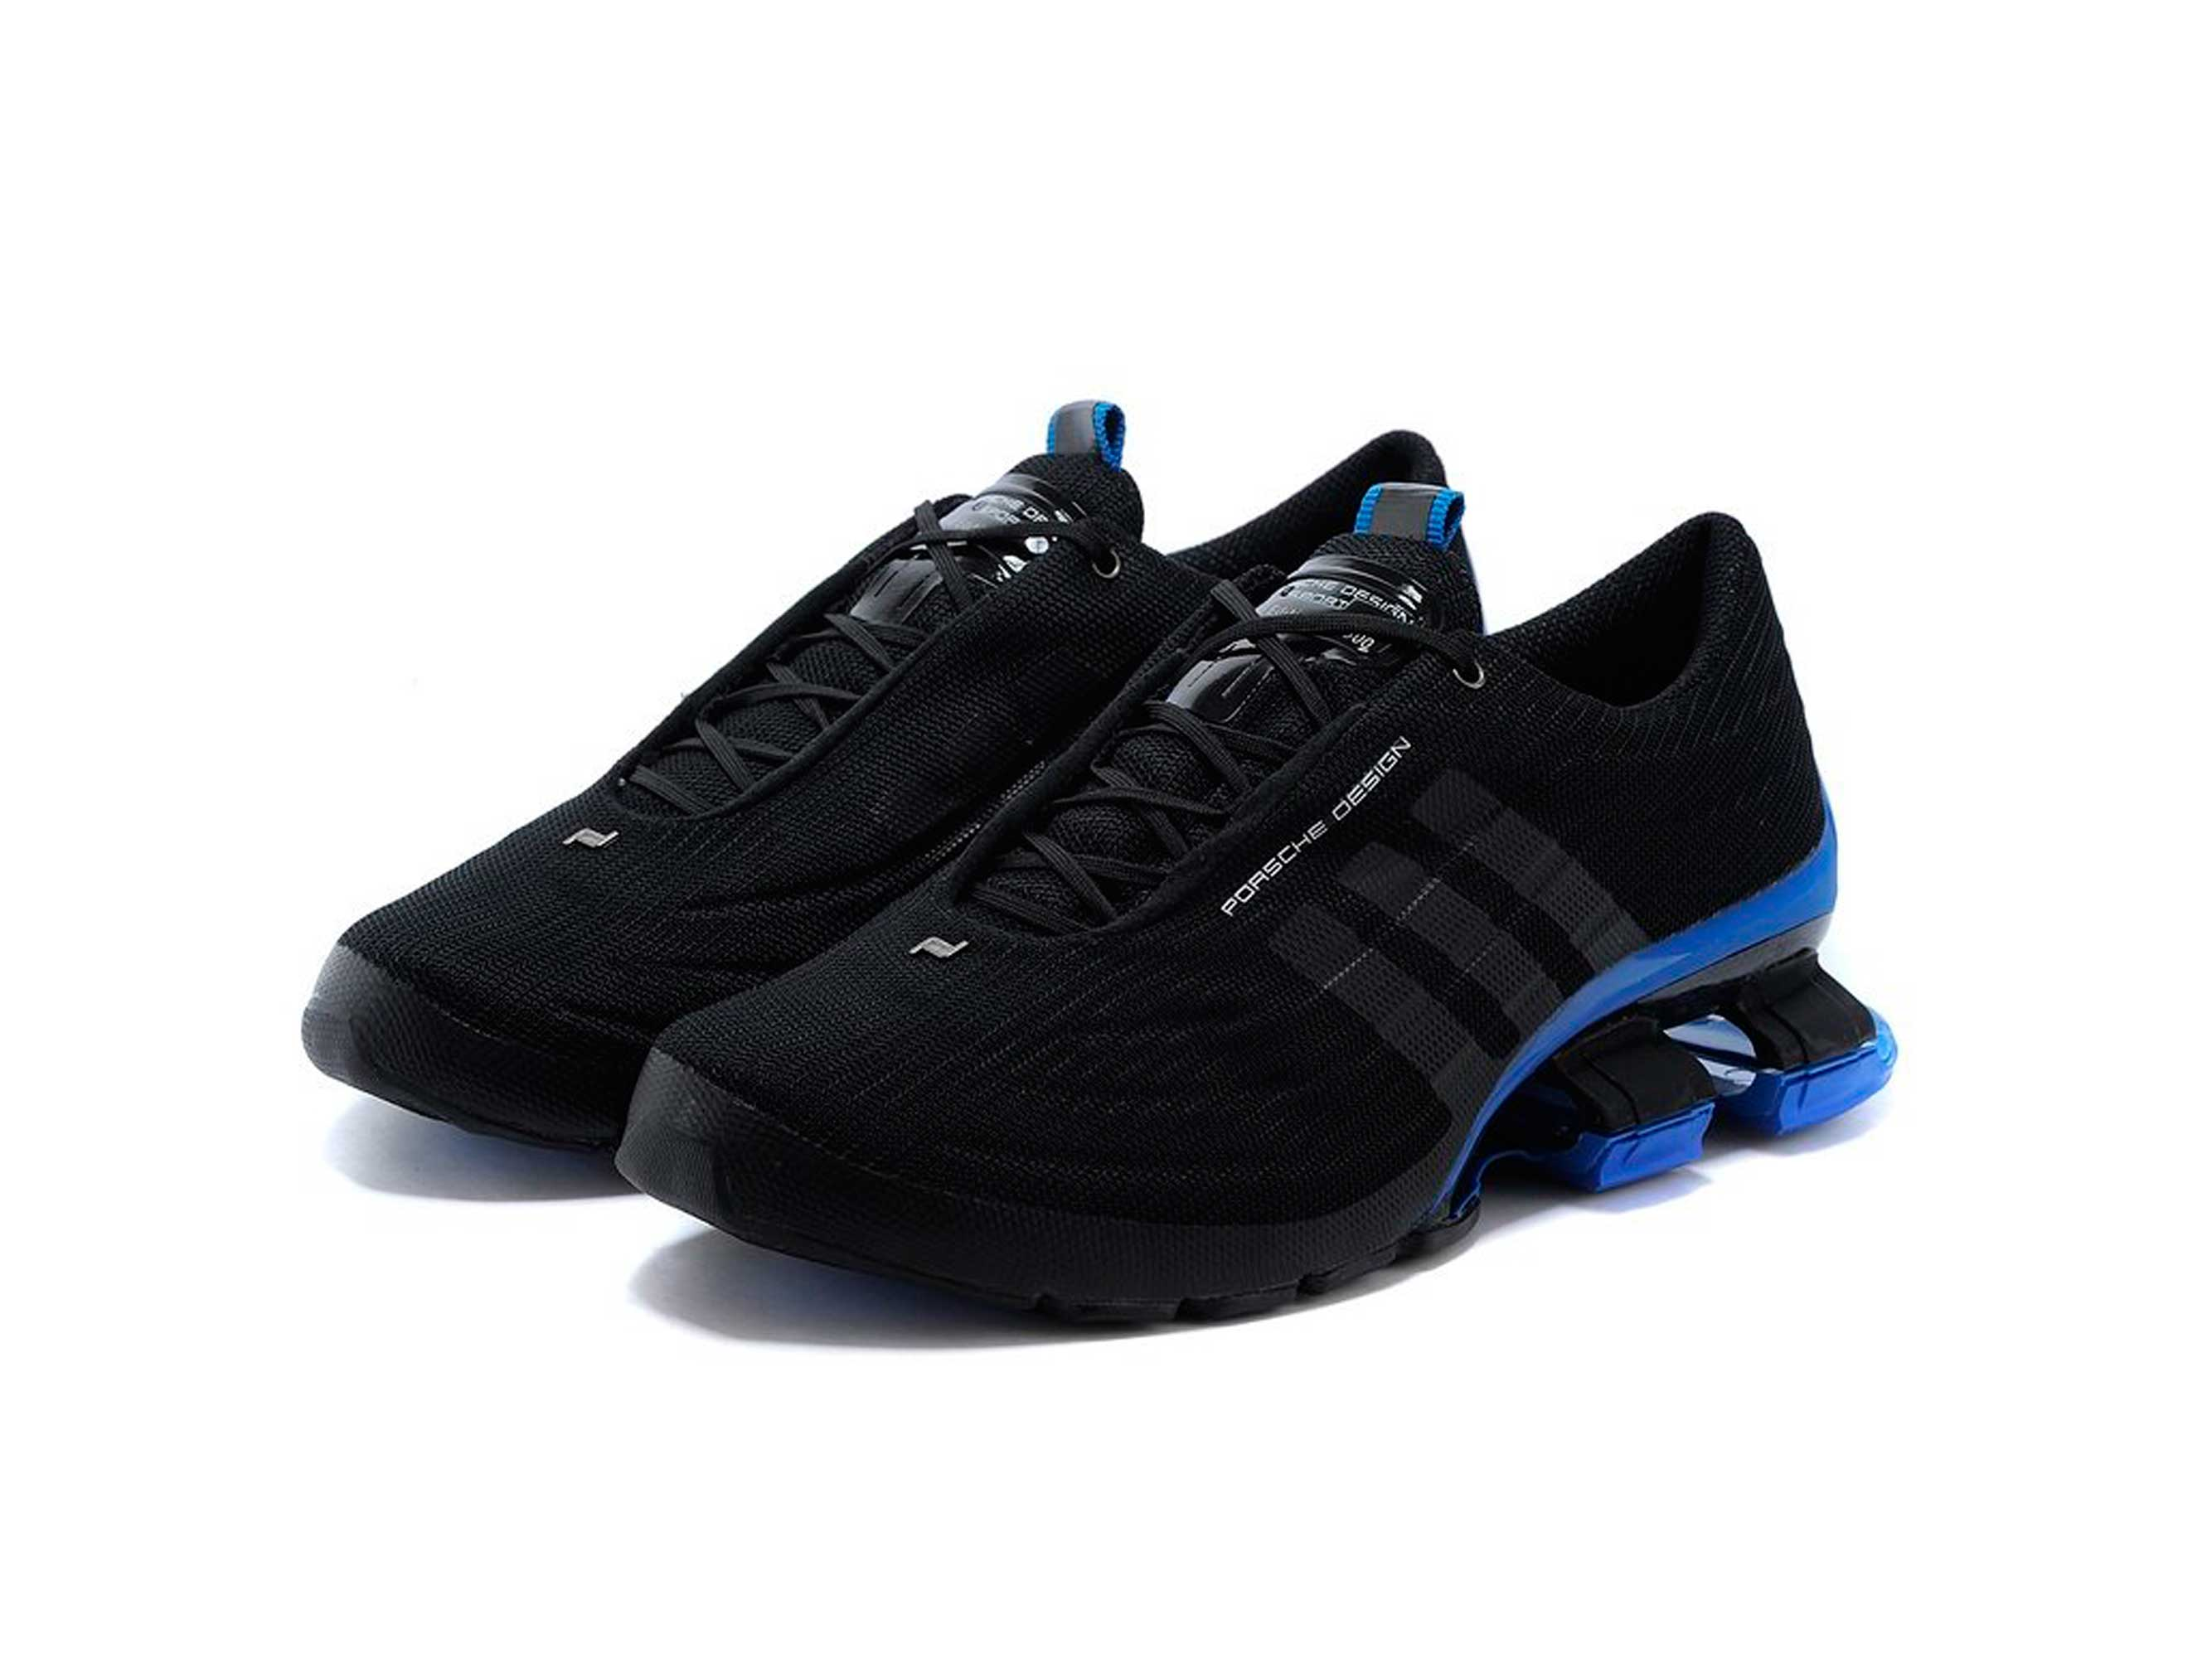 big sale 0d967 f98fa adidas porsche design bounce S4 black blue